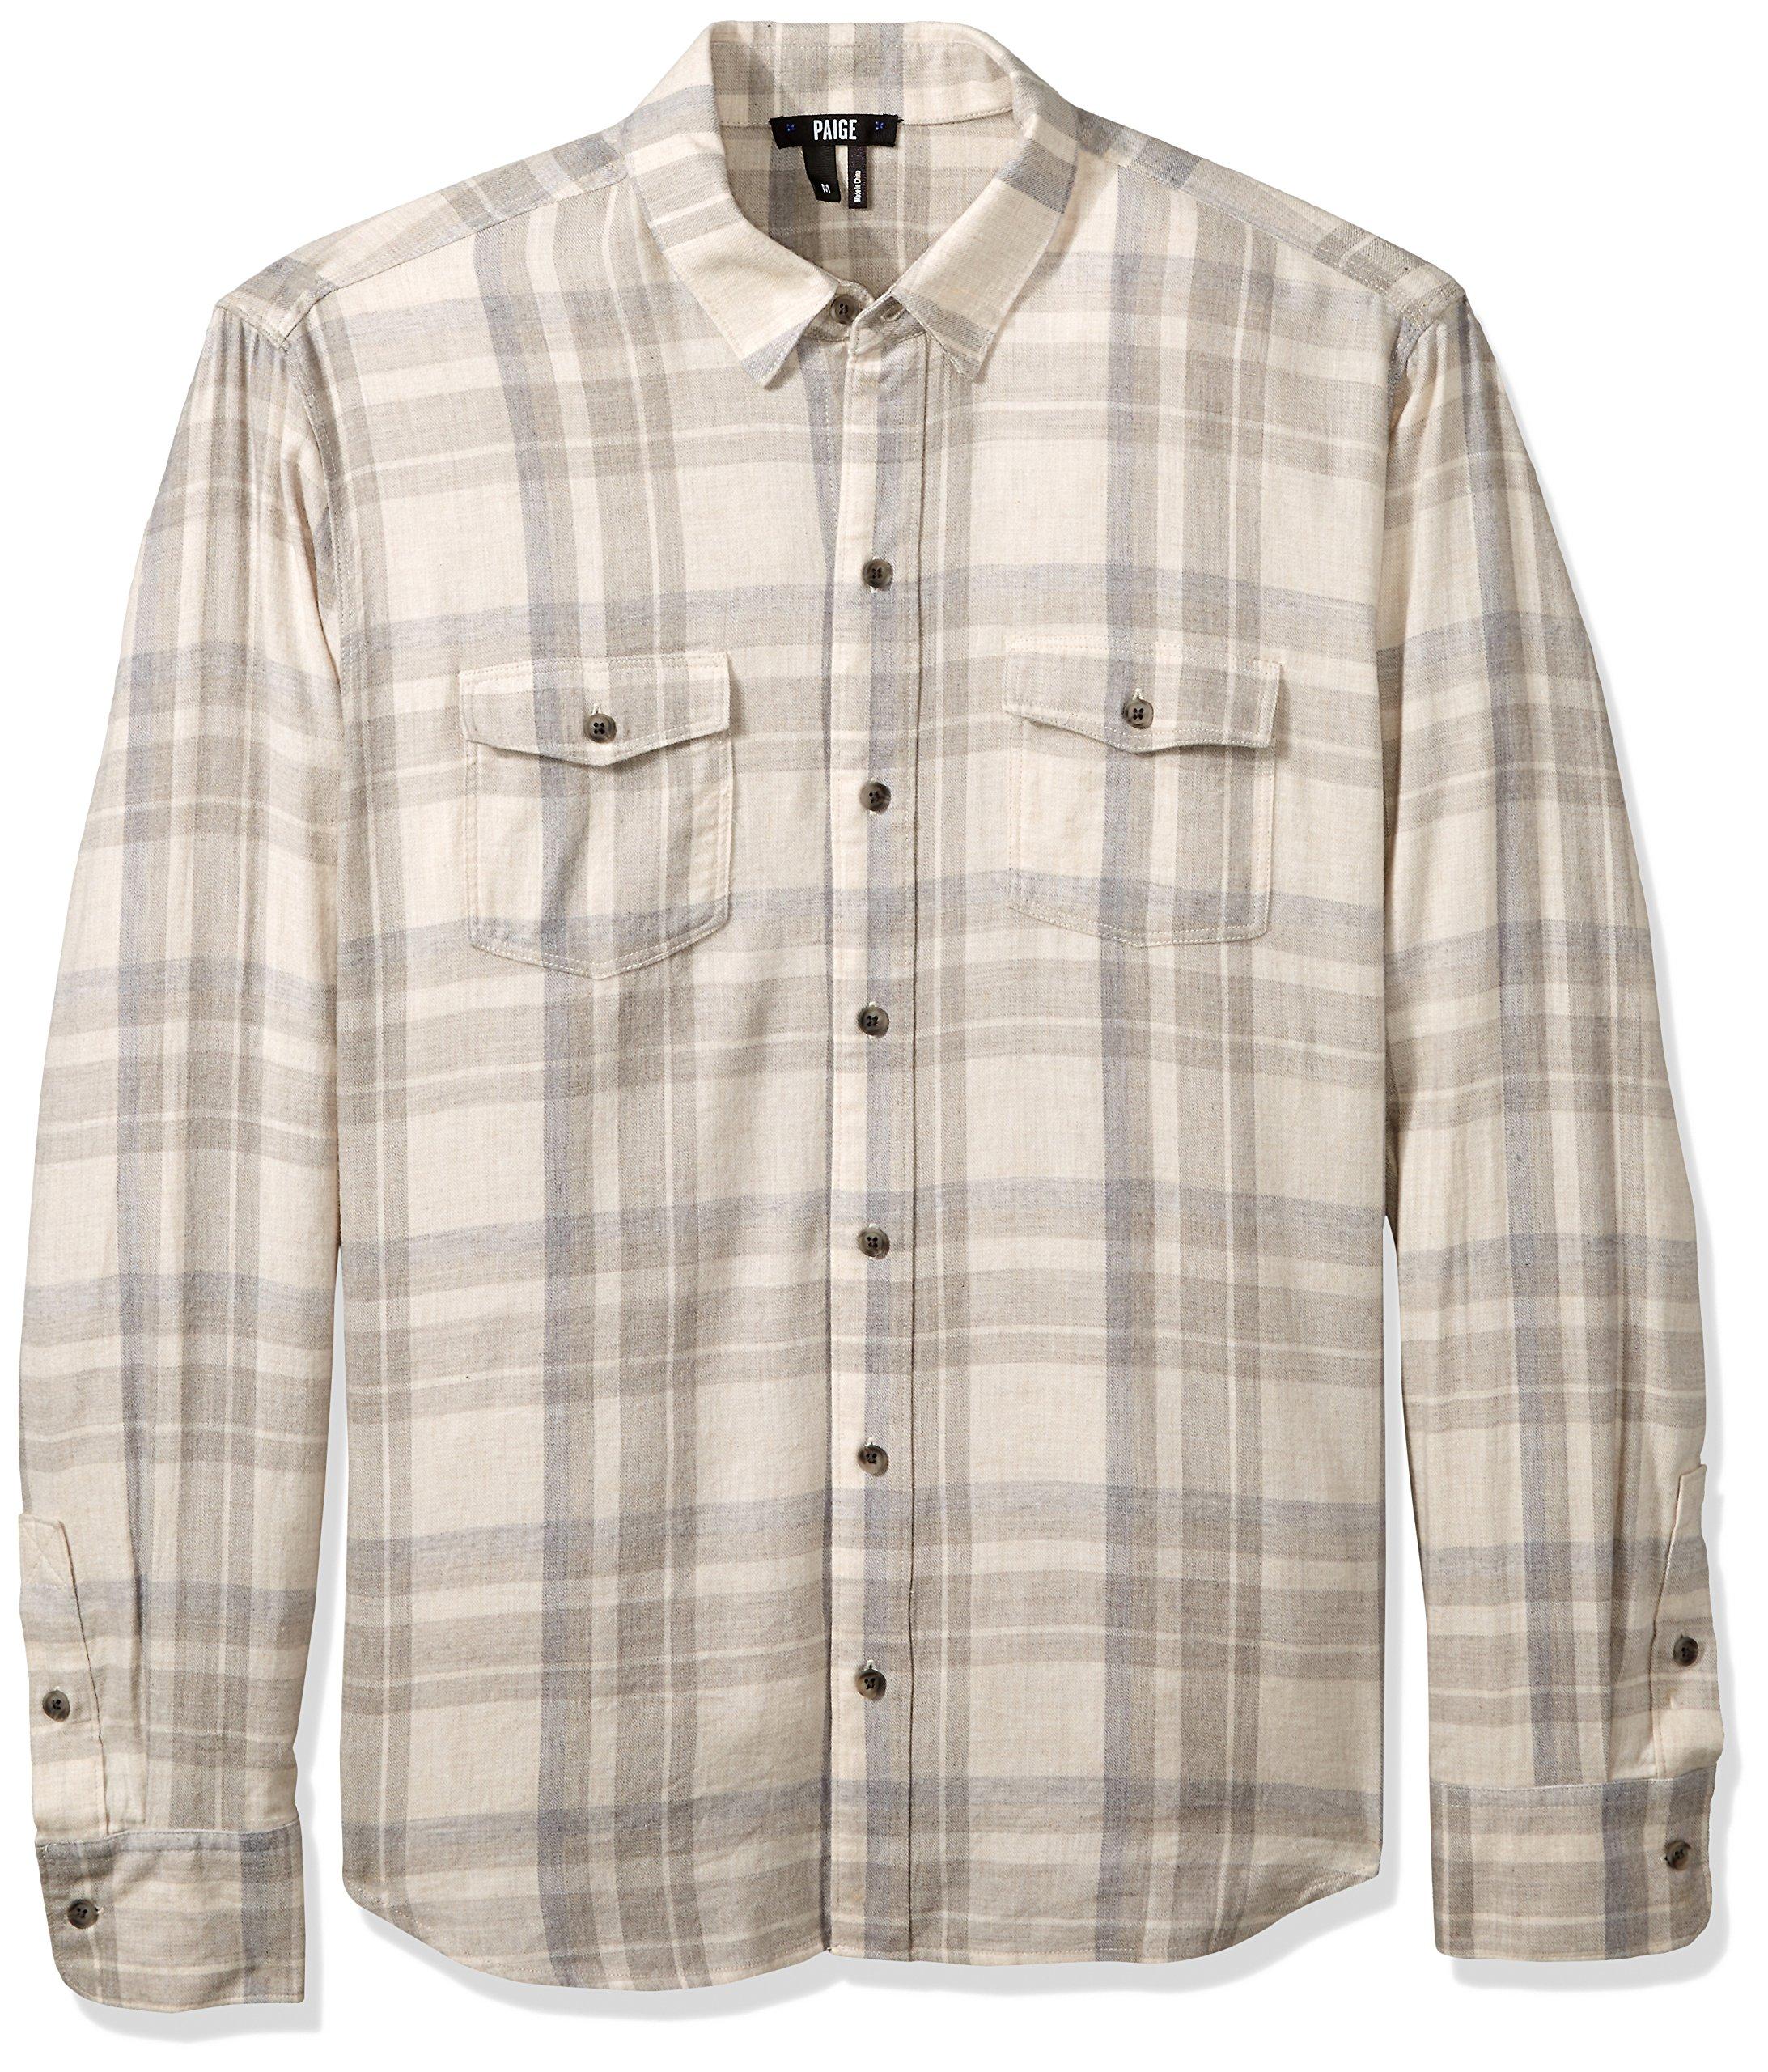 PAIGE Men's Everett Brushed Cotton Button Down Shirt, Maritime Grey XL